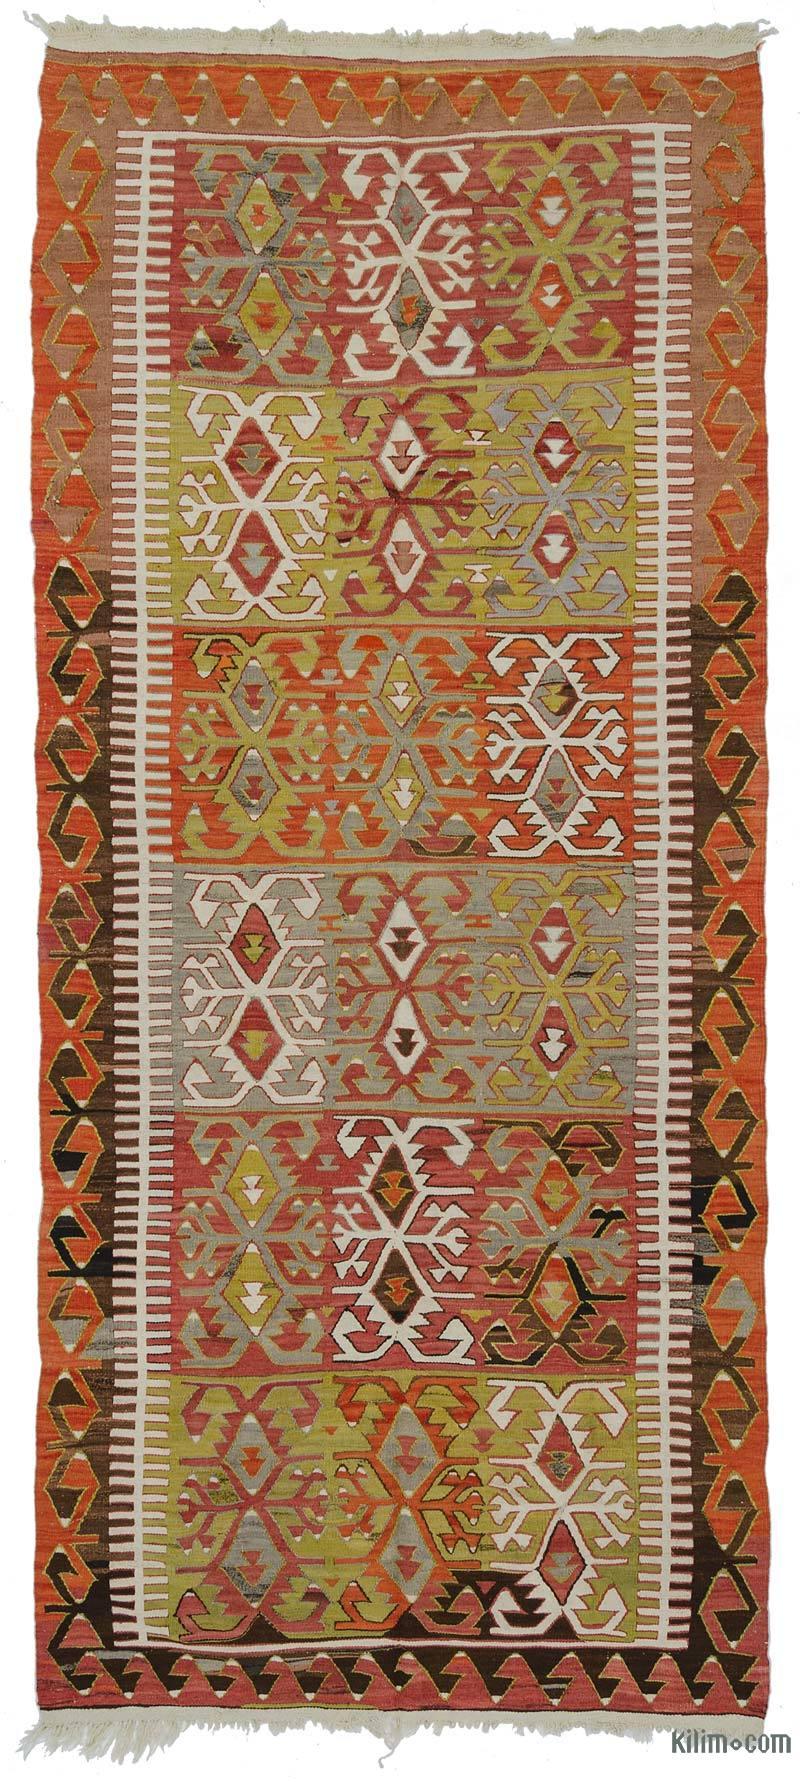 K0027729 Multicolor Vintage Konya Kilim Rug 4 8 Quot X 10 10